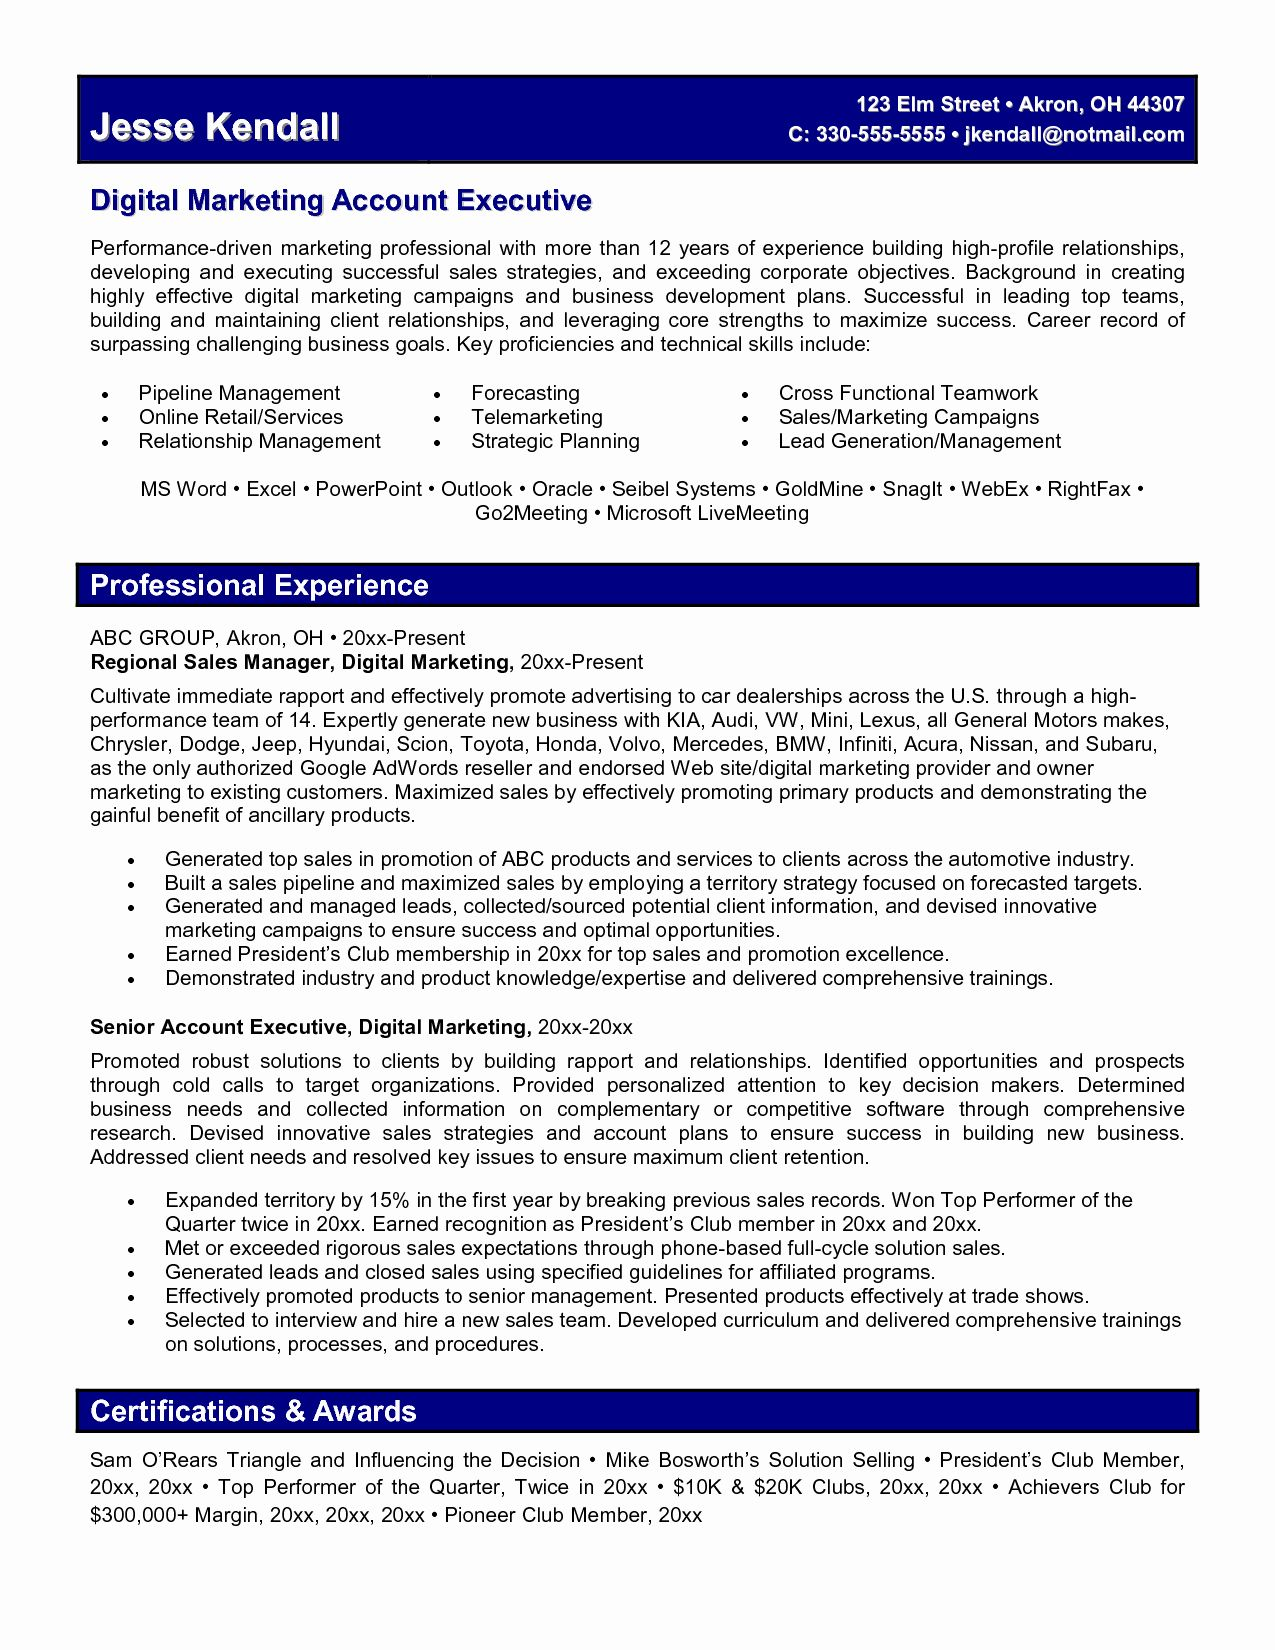 20 Digital Marketing Manager Resume Marketing resume